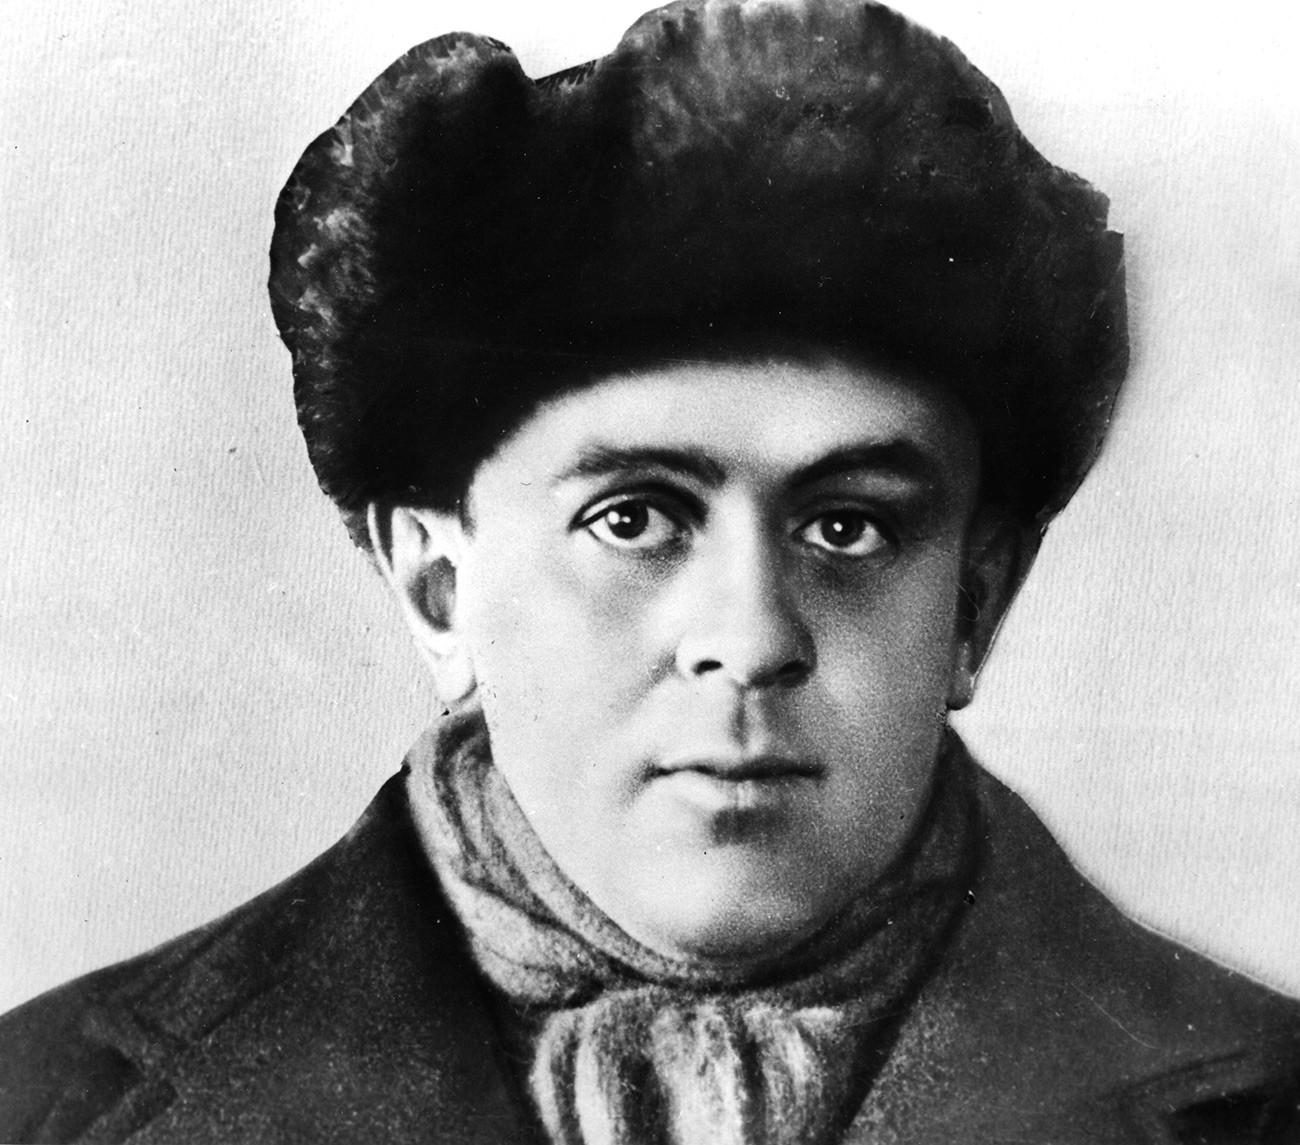 John Reed in Moskau, ca. 1917-1918